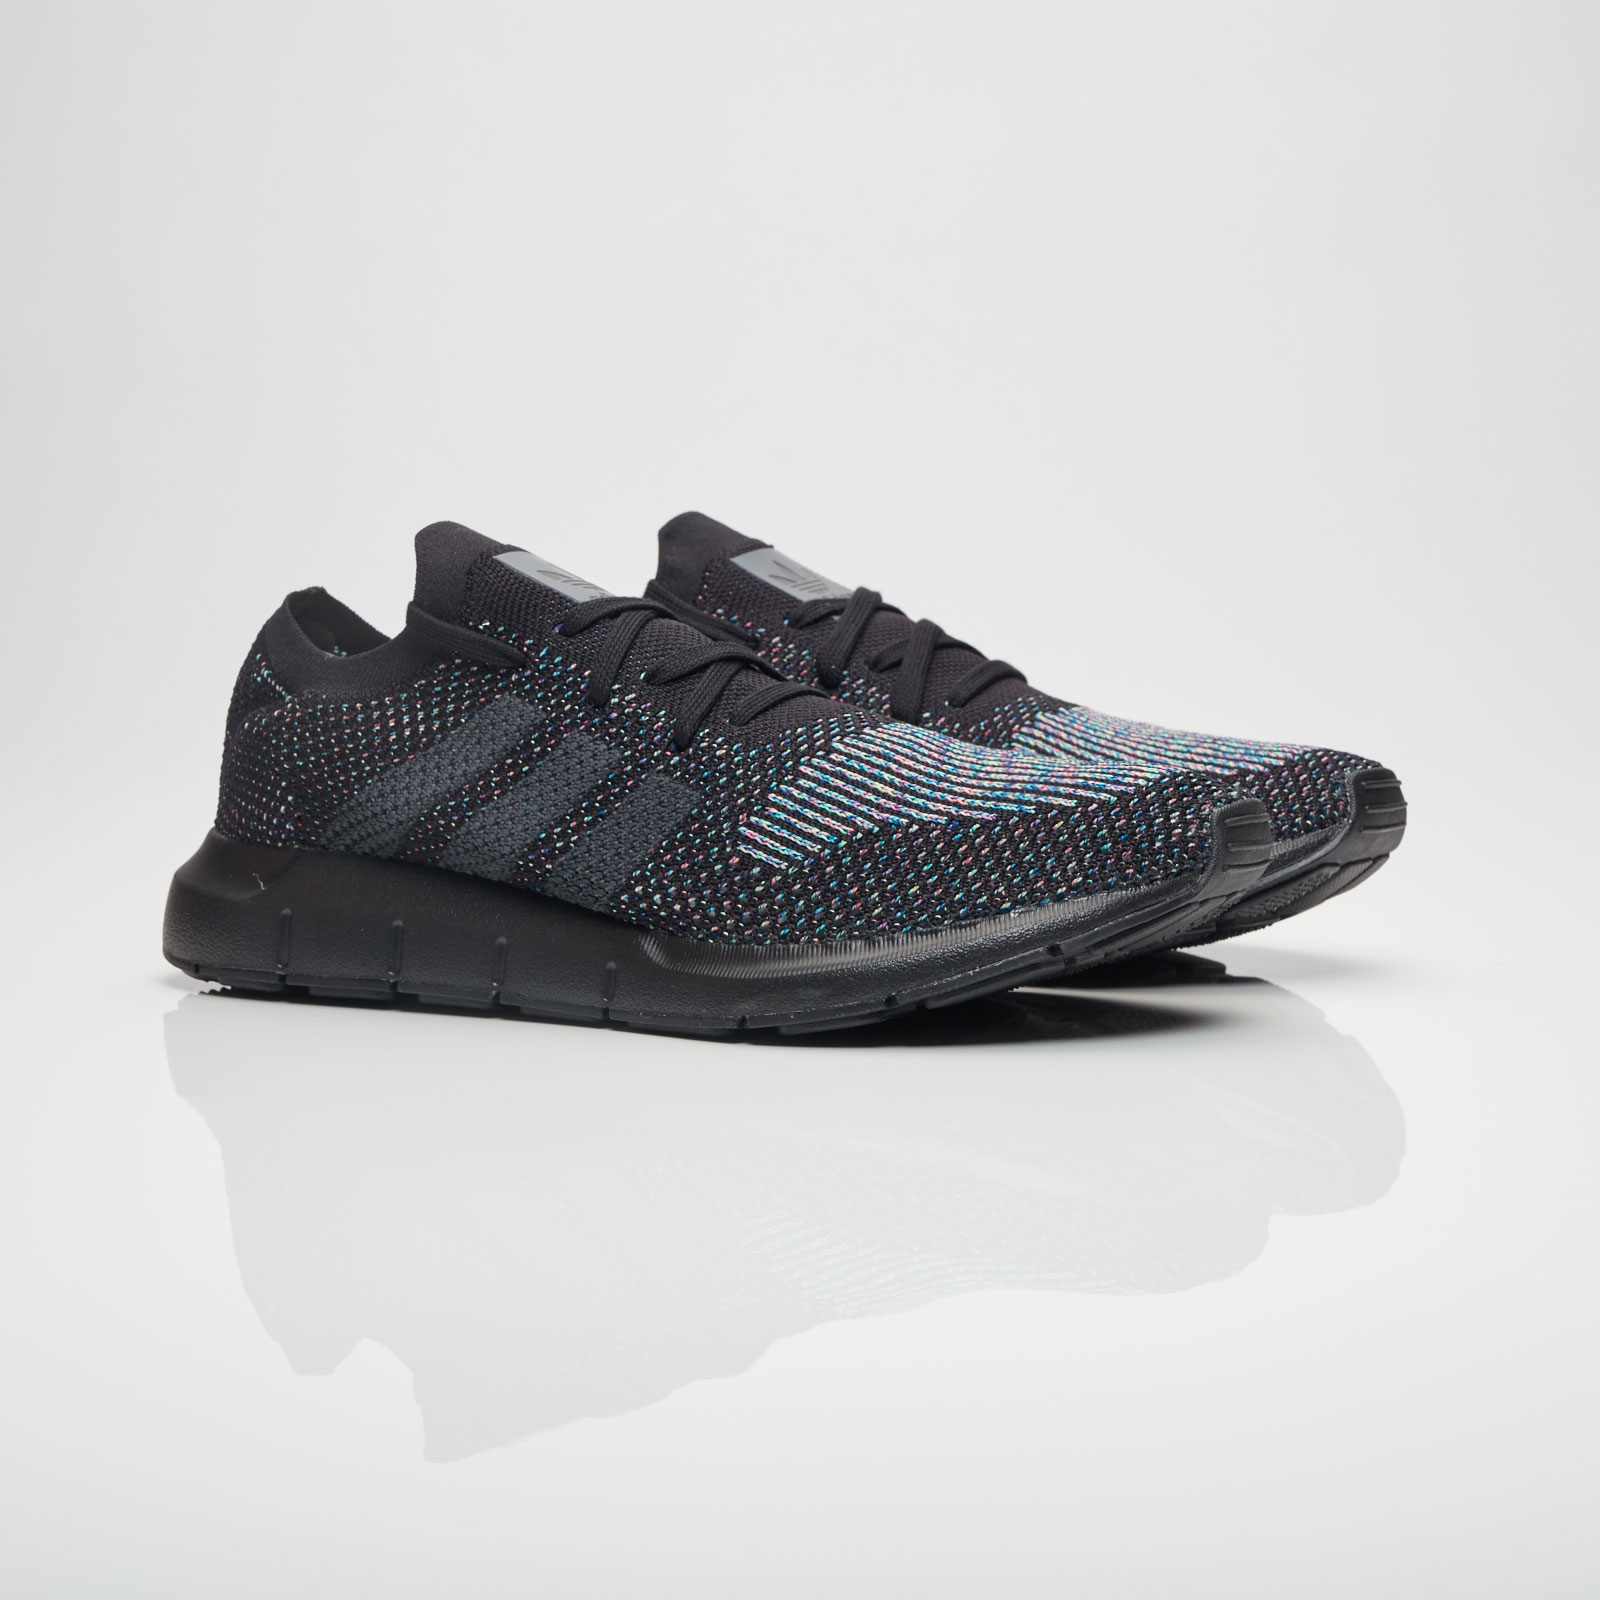 adidas Swift Run PK - Cg4127